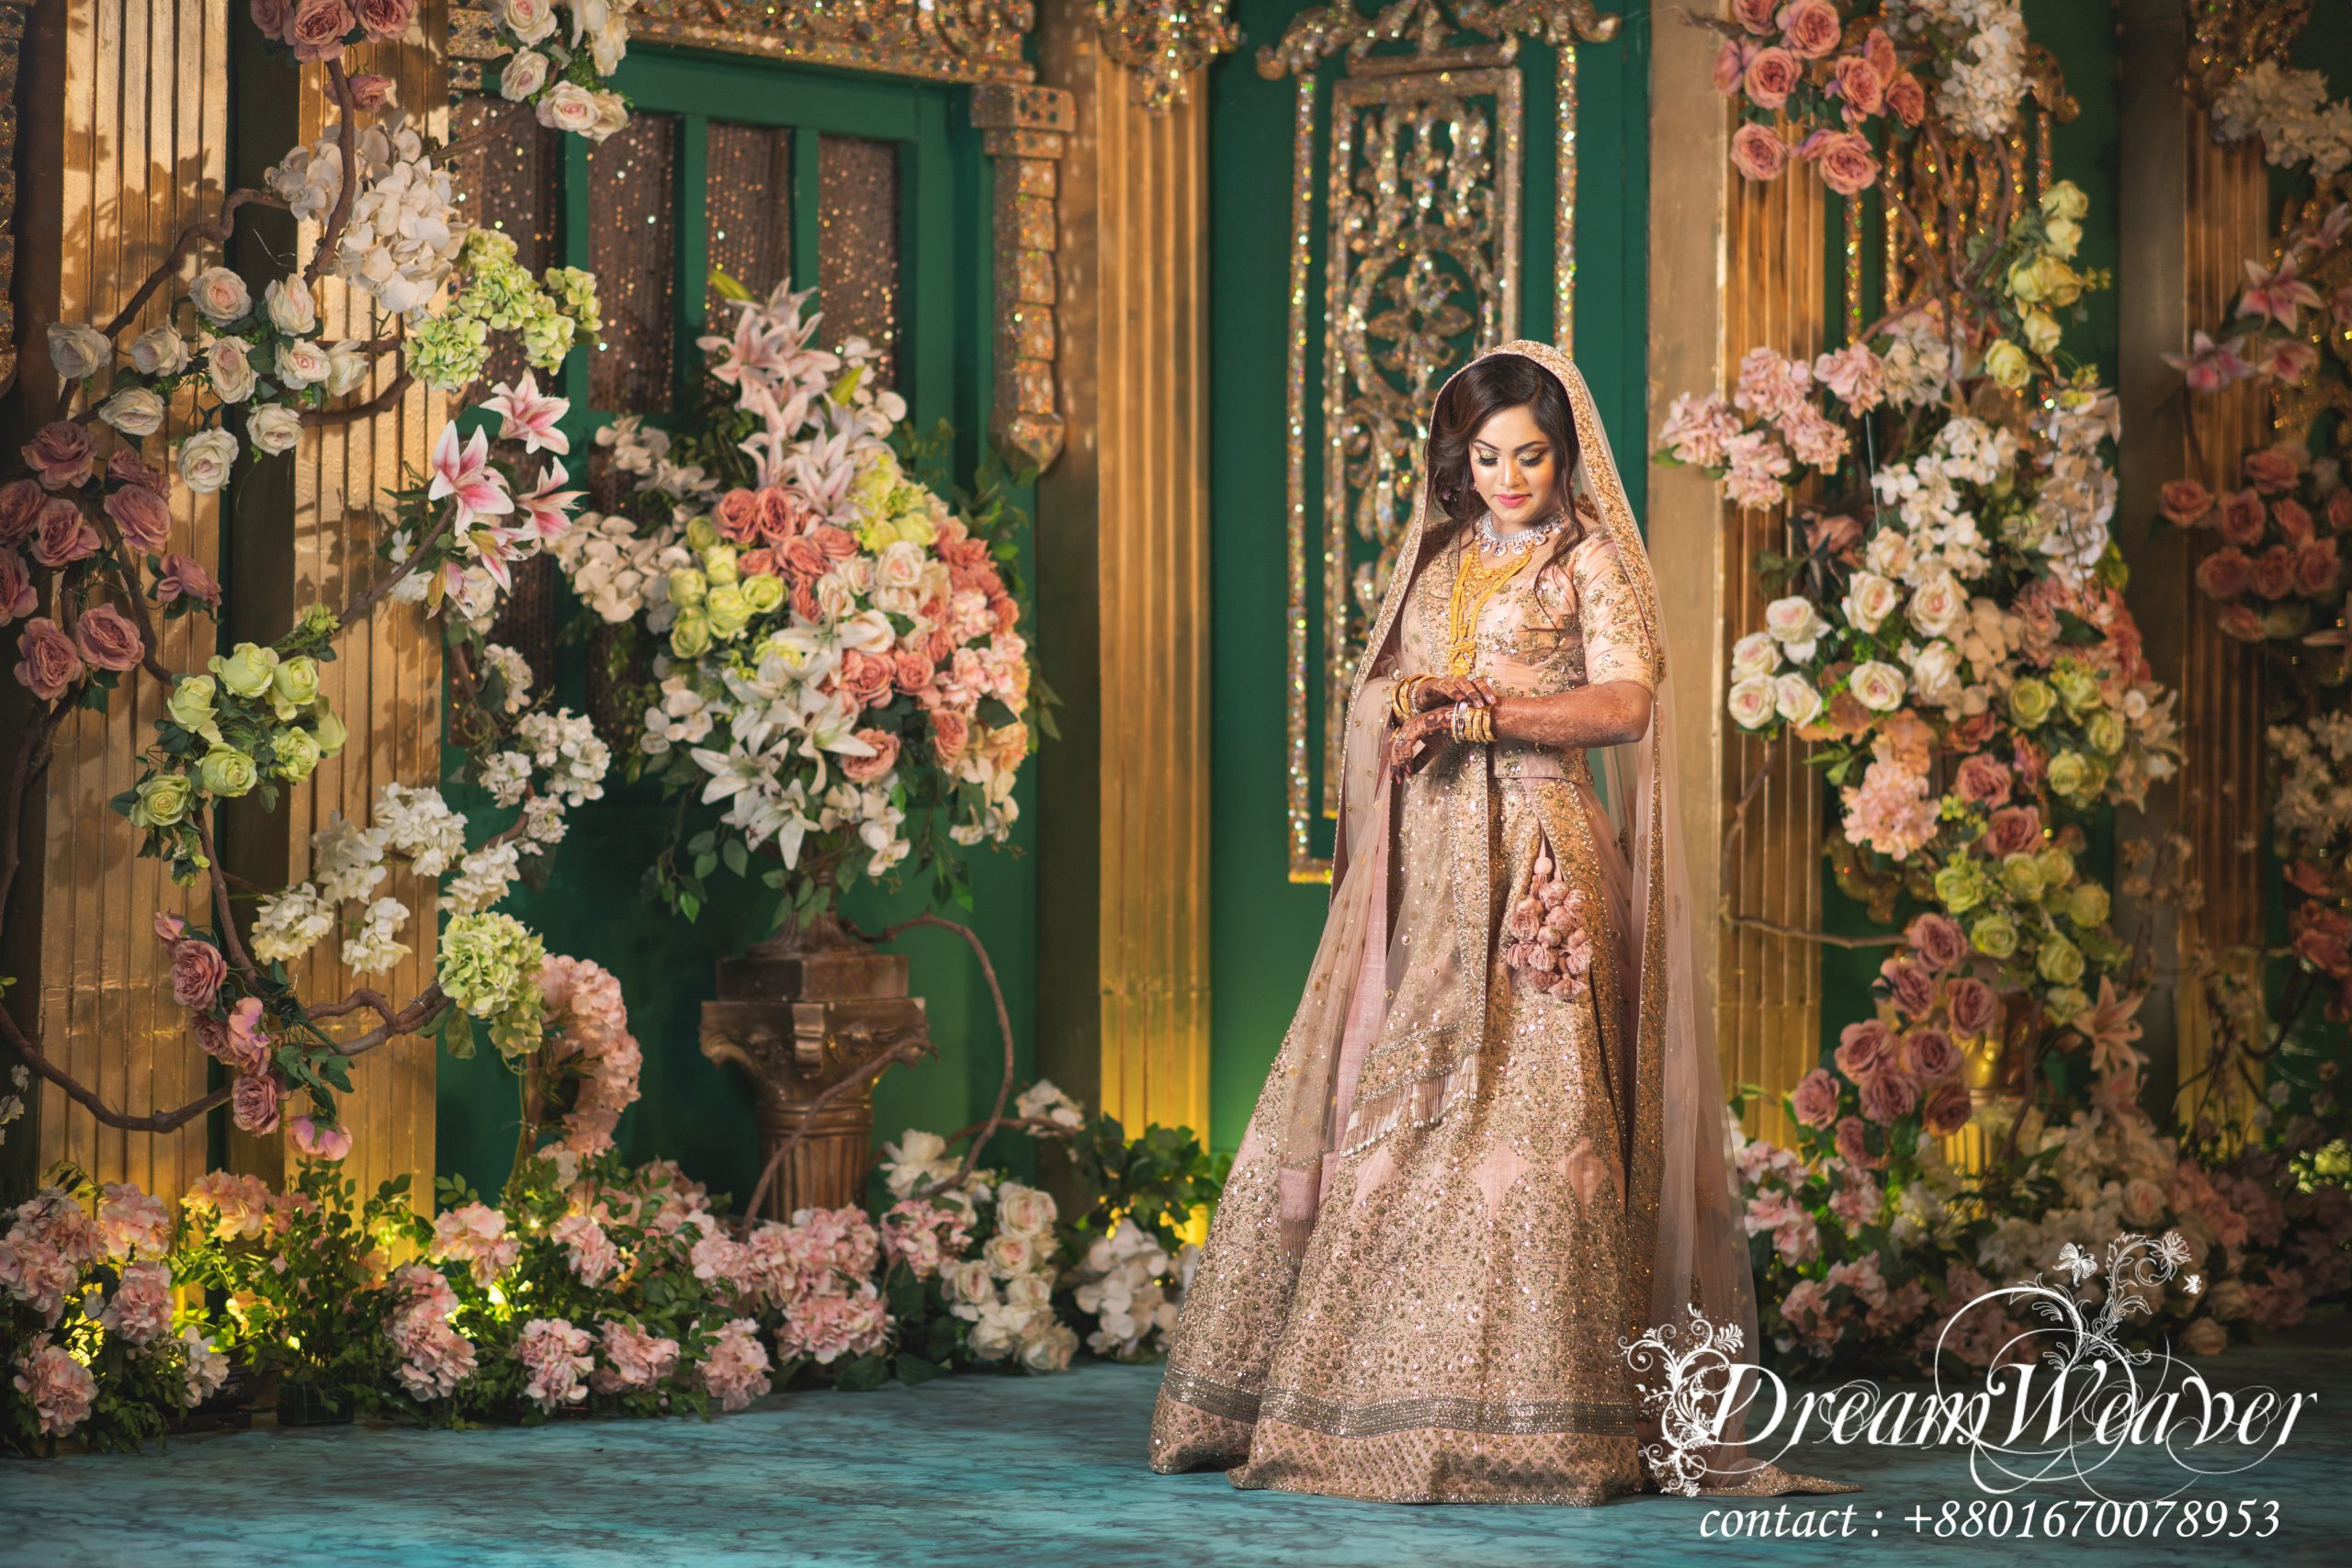 Royal Muslim Wedding Portraits of Bride